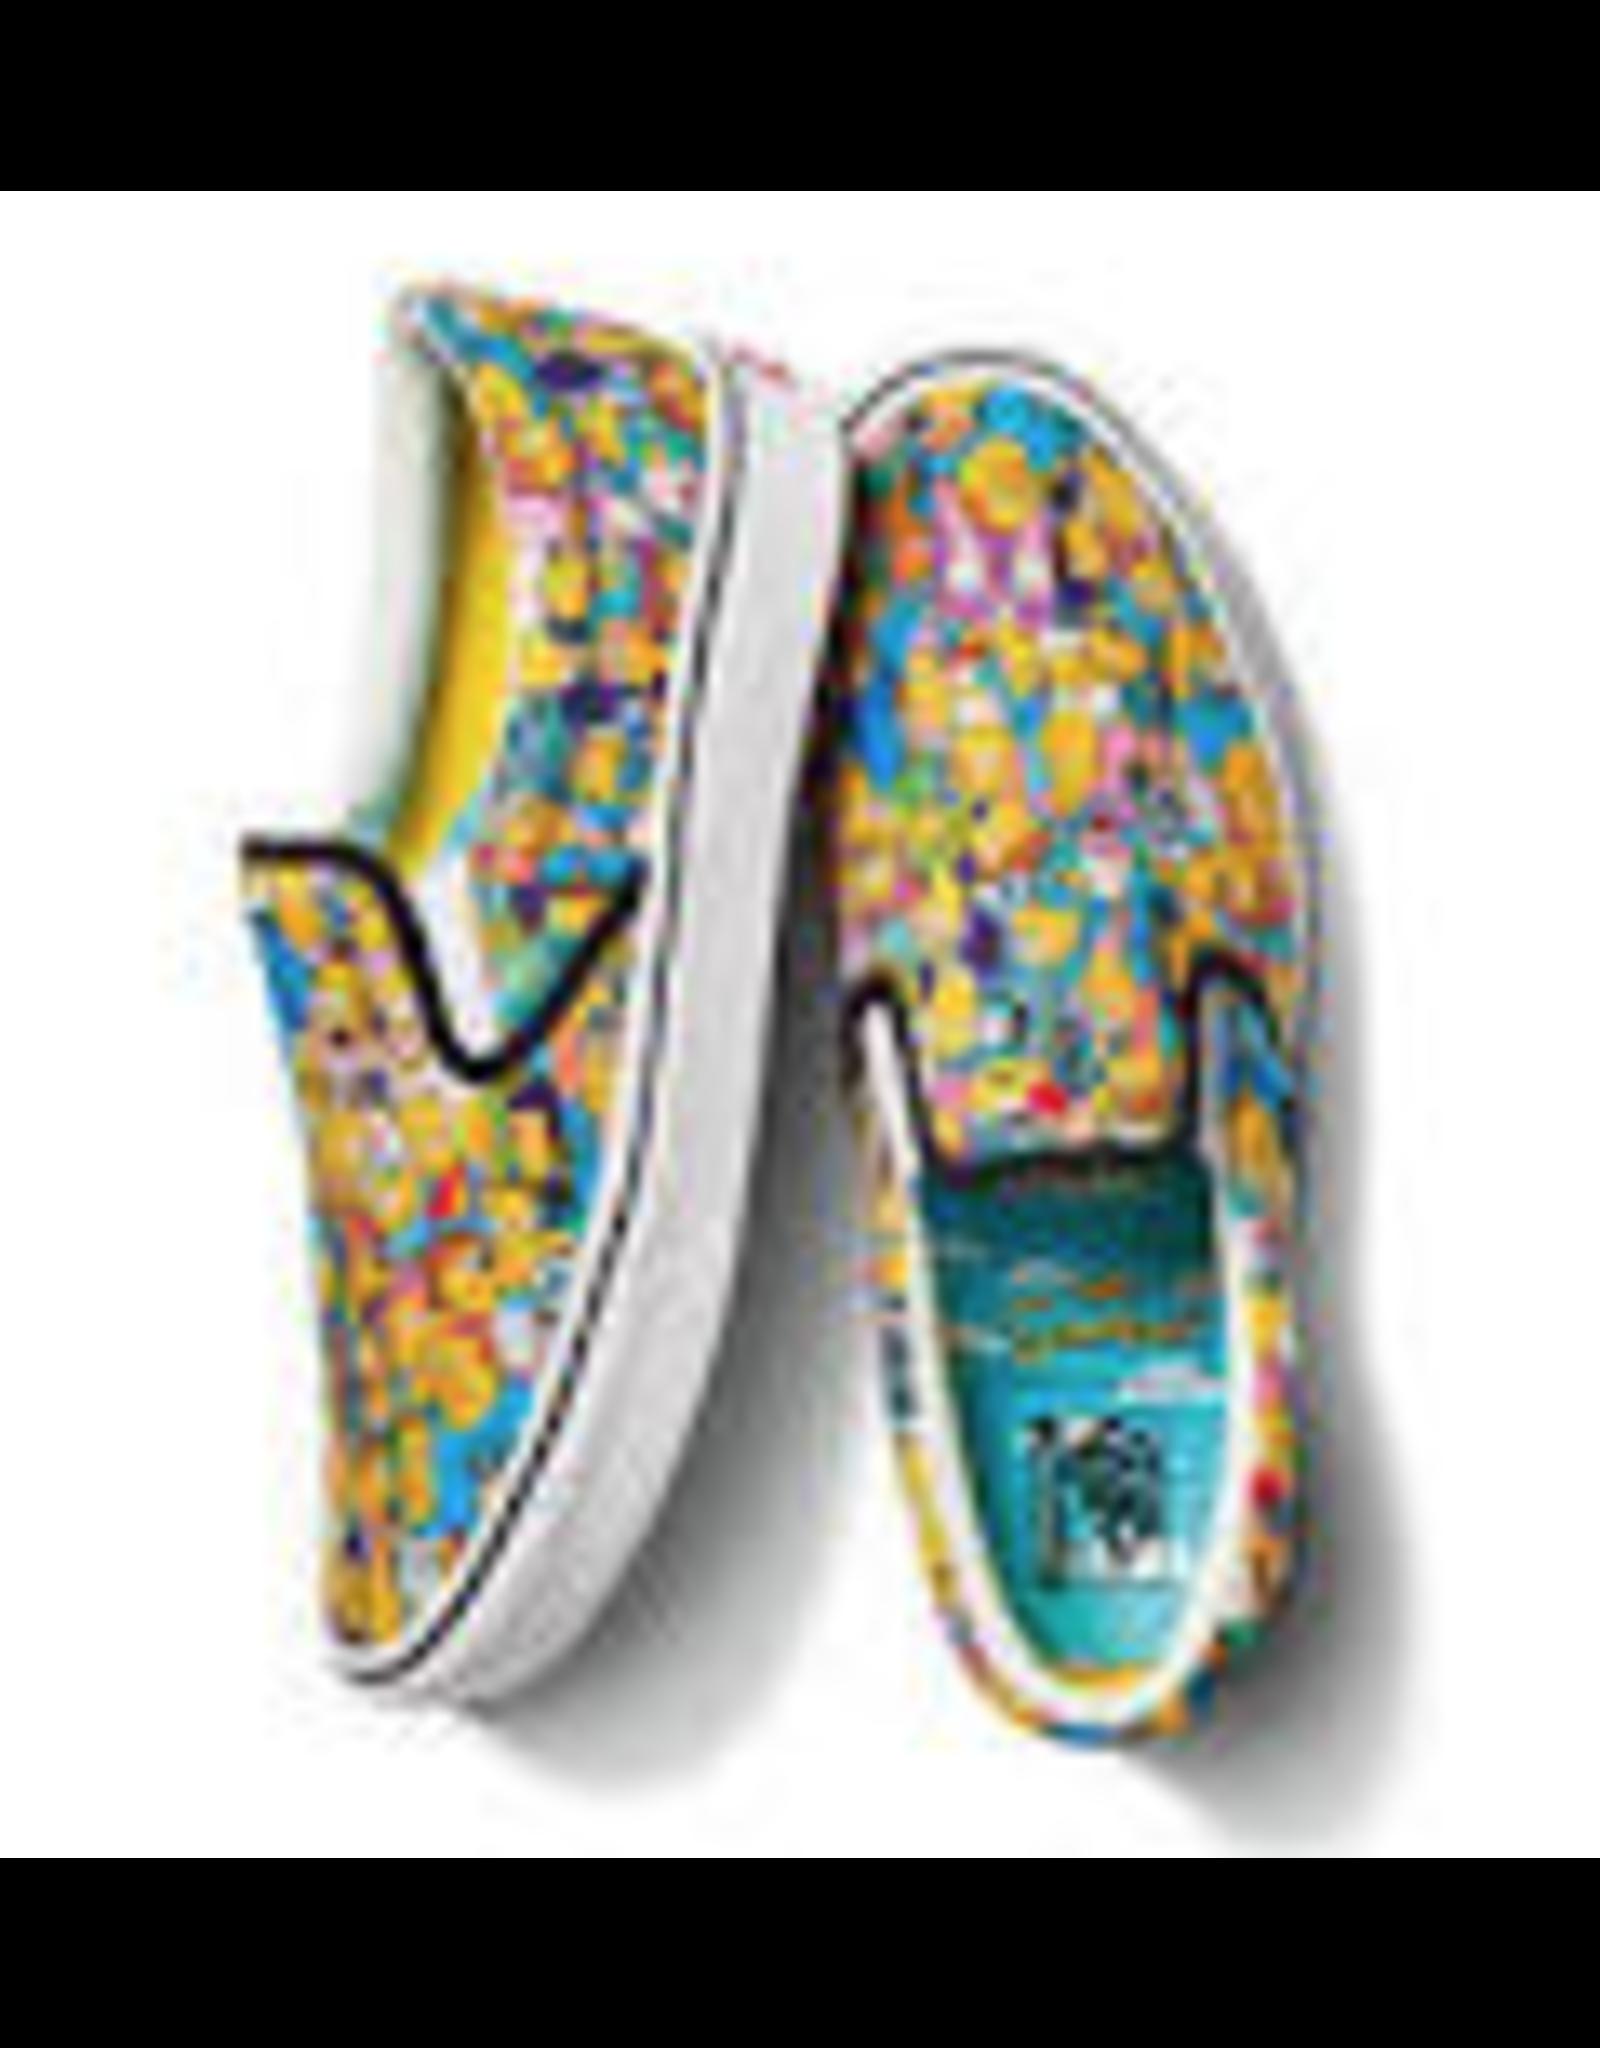 Vans The Simpsons ComfyCush Slip-on - Springfield